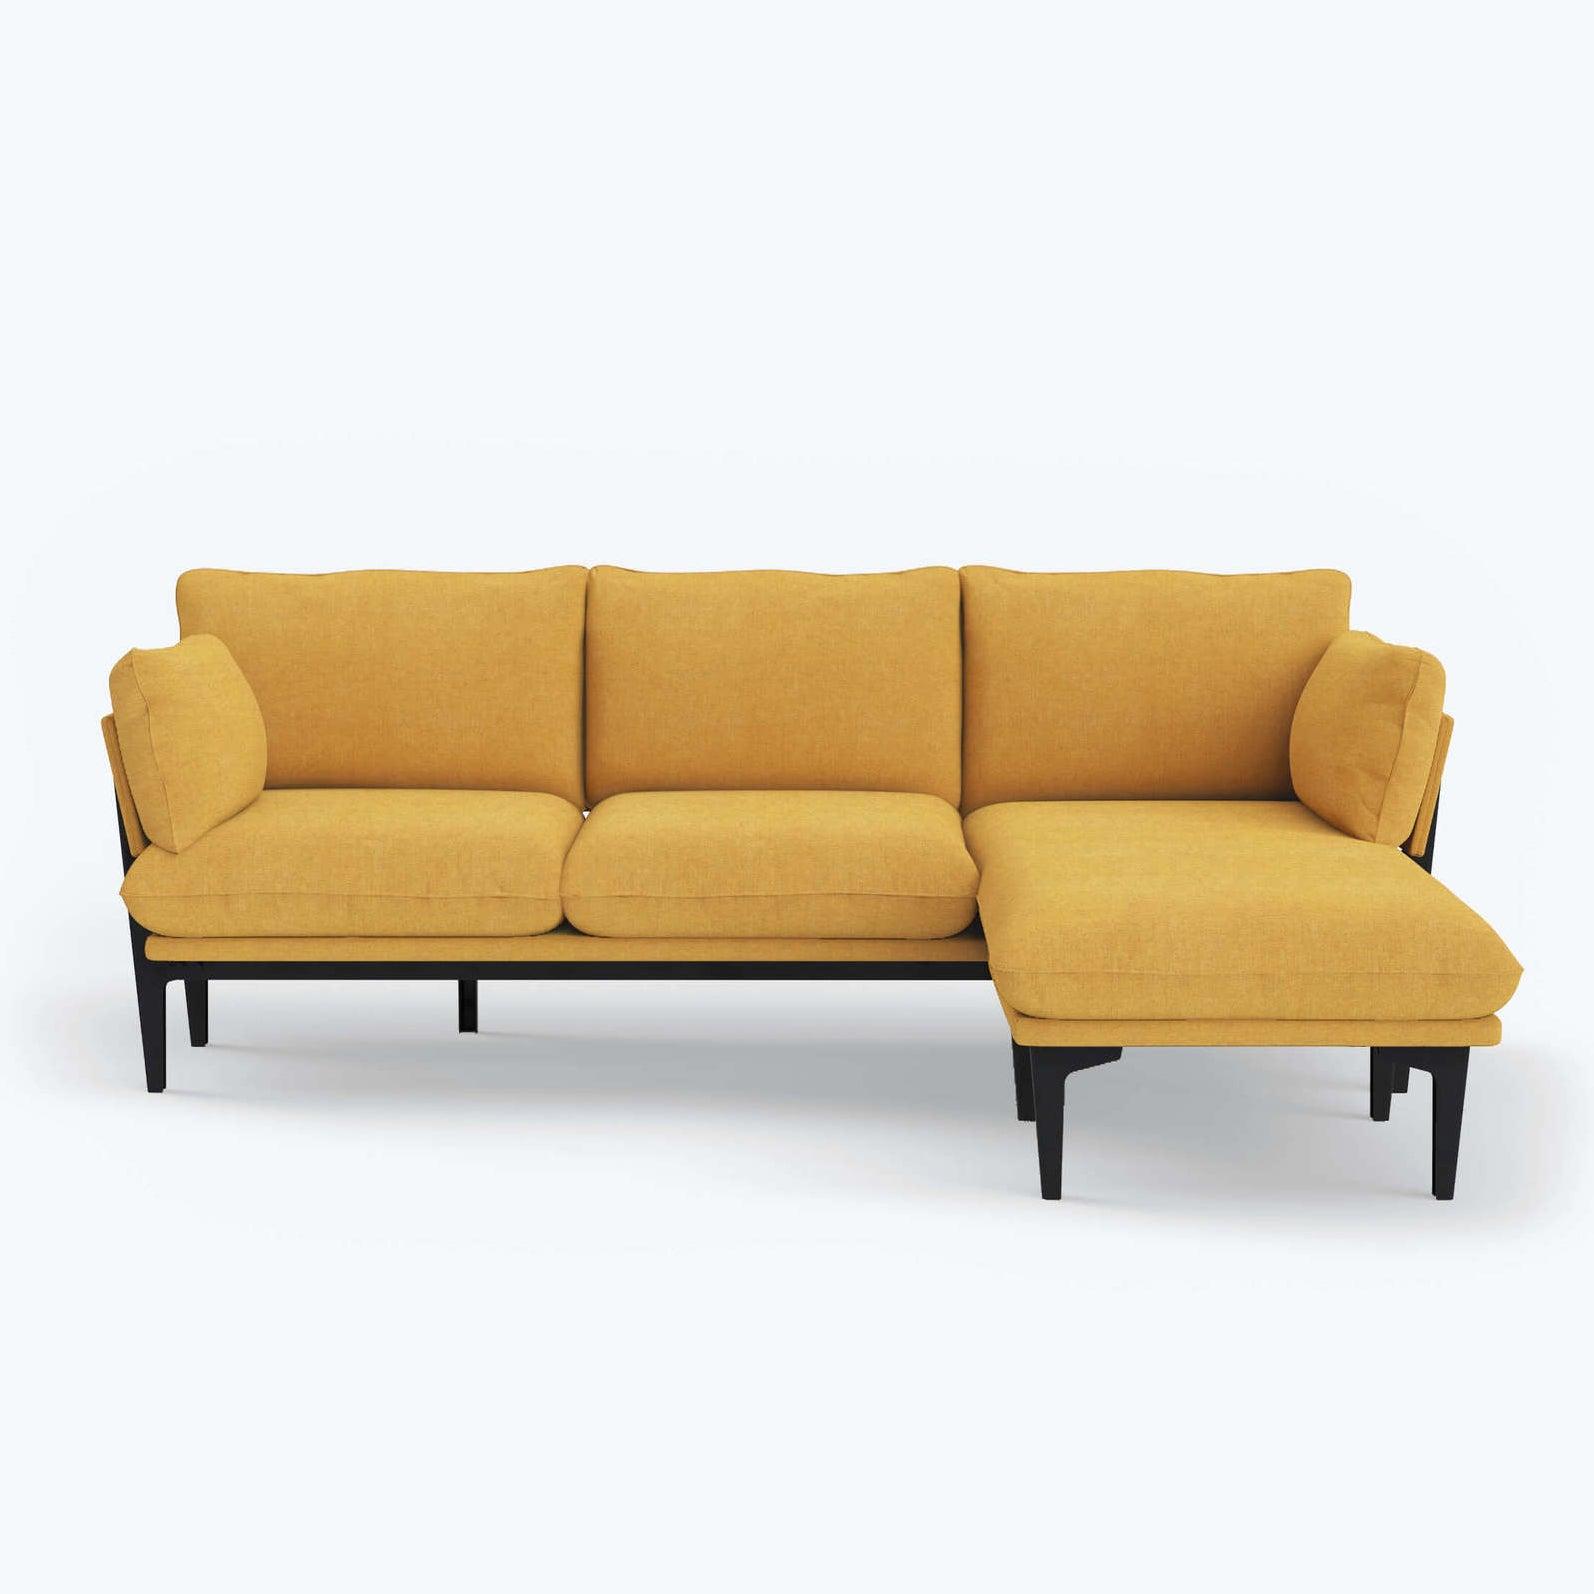 SOFA_0023_24-Three-Seater-Chaise-Uph-Saffron